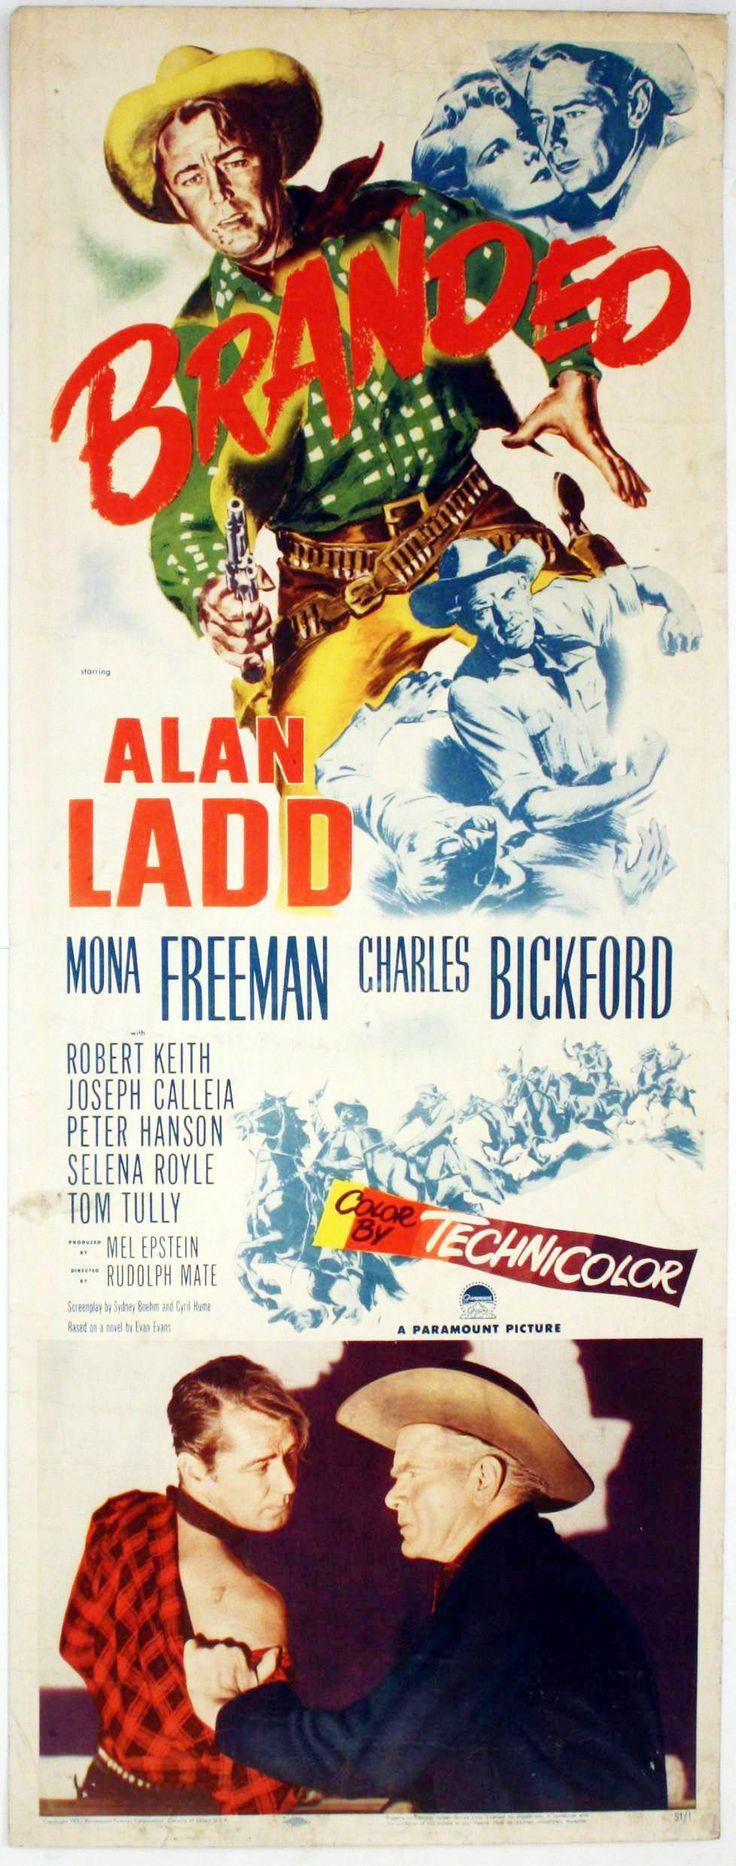 Branded 1949 alan ladd mona freeman charles bickford robert keith